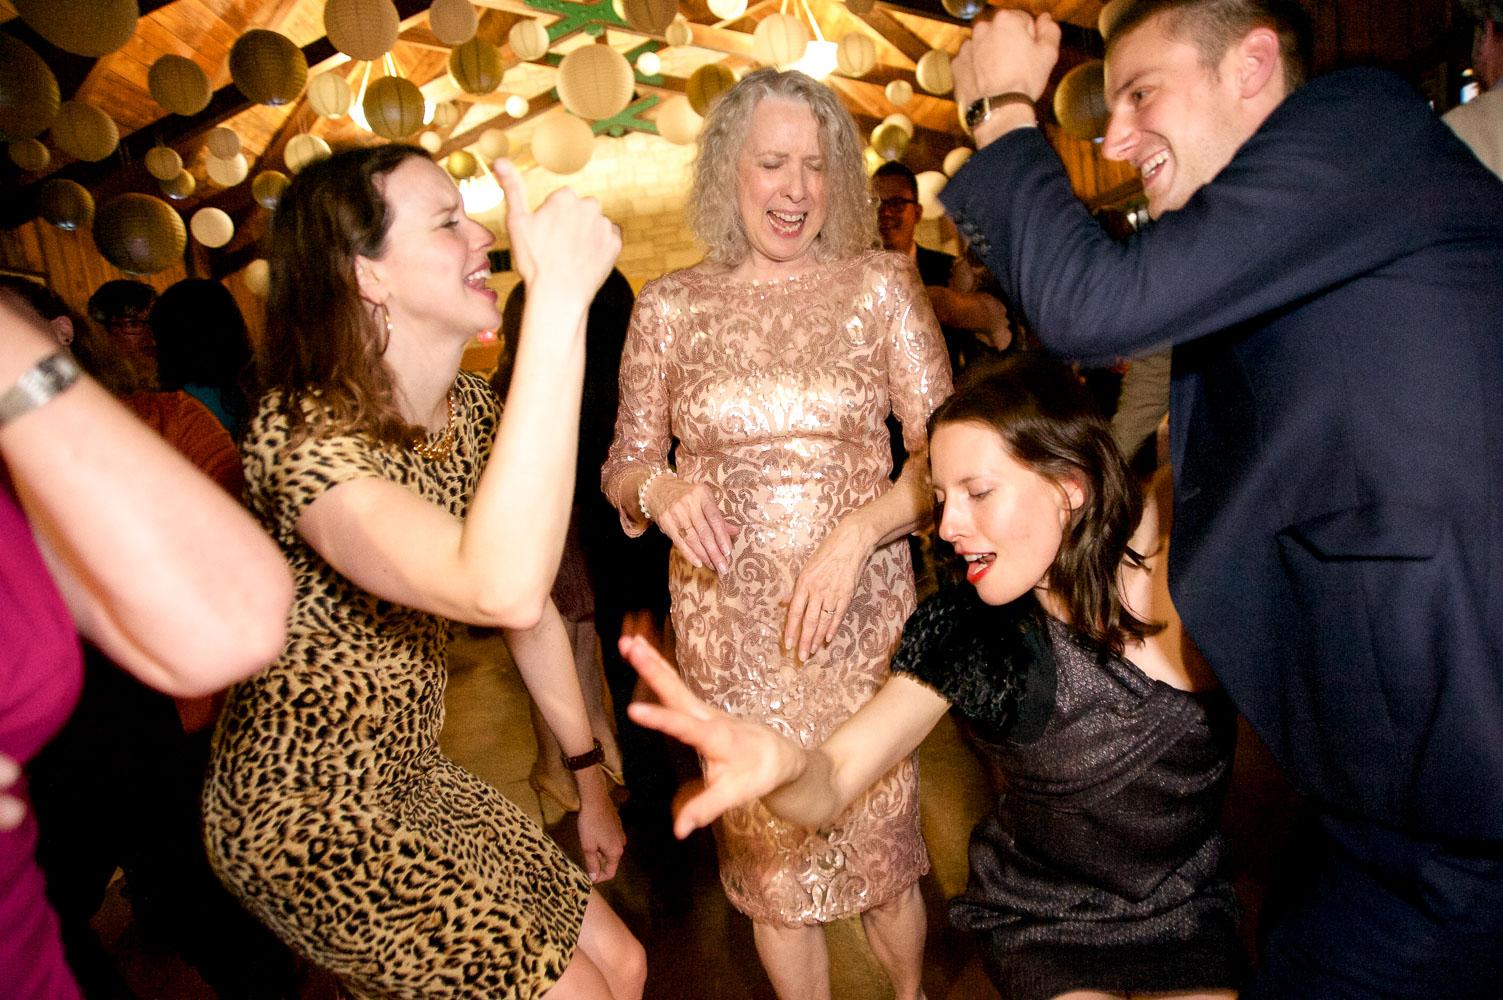 2015.06.19_Williams-Froelich_Wedding  2015.06.19_Williams-Froelich_Wedding